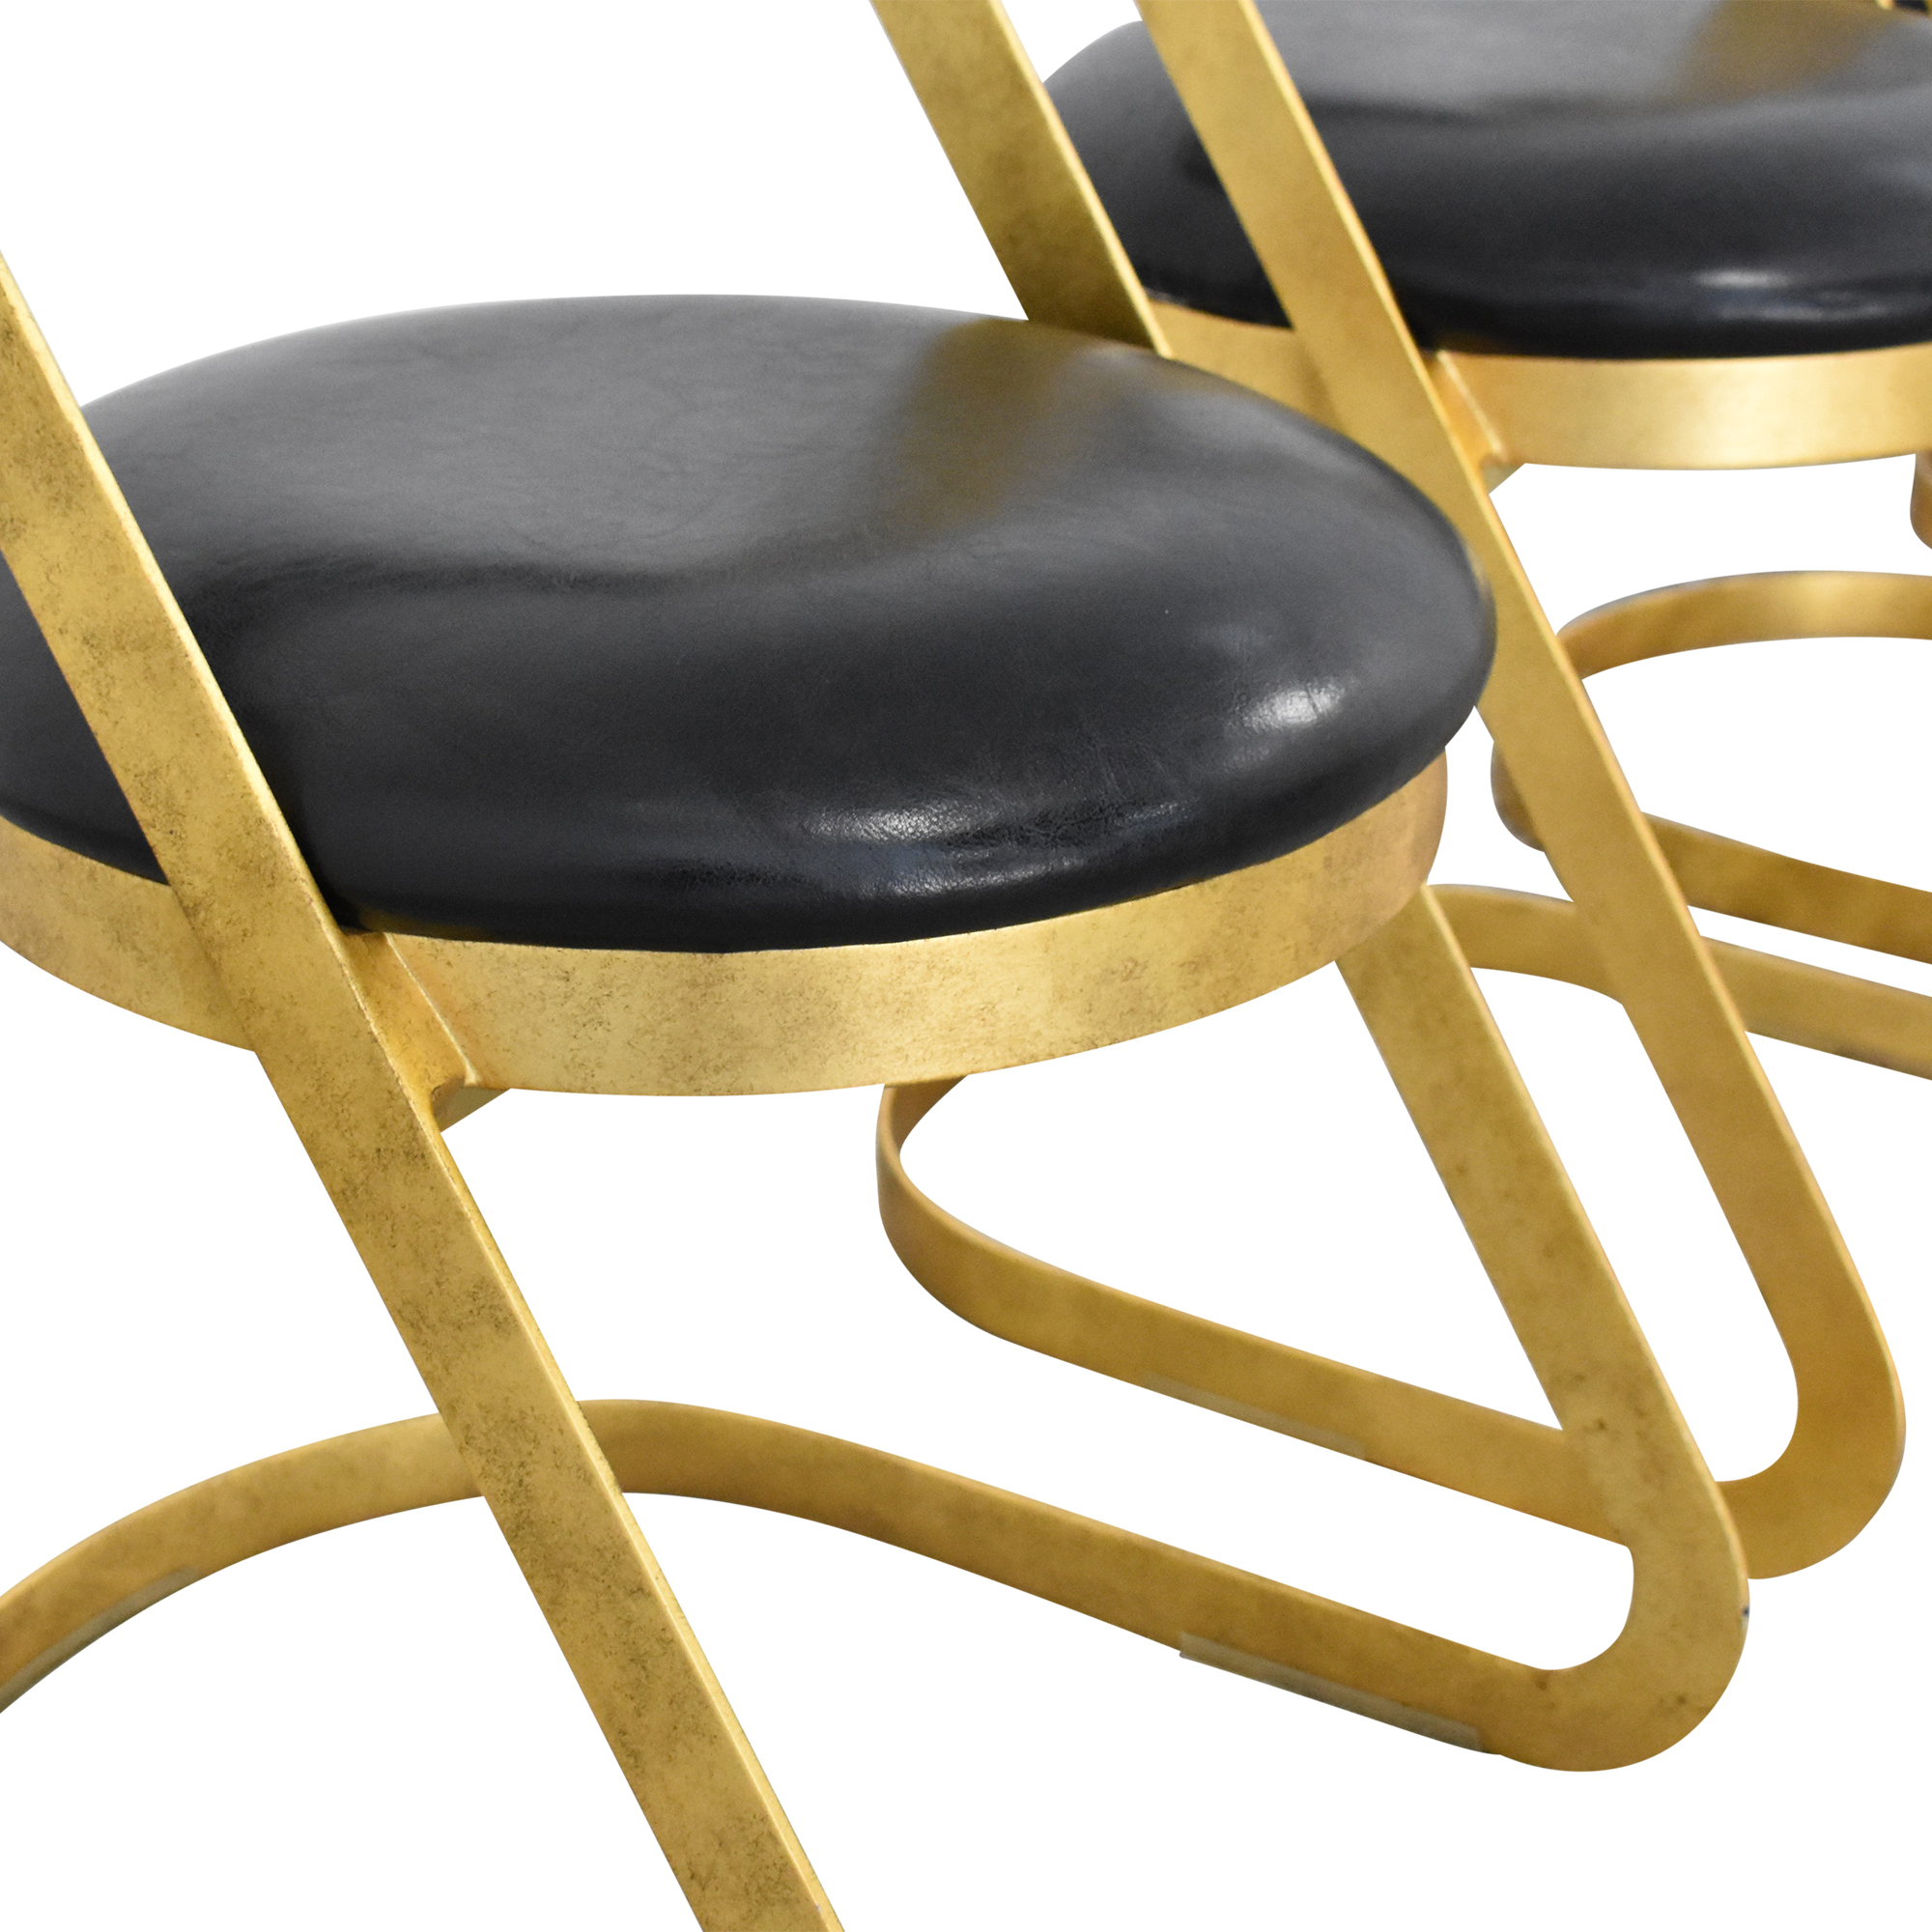 DwellStudio DwellStudio Farrah Dining Chairs on sale